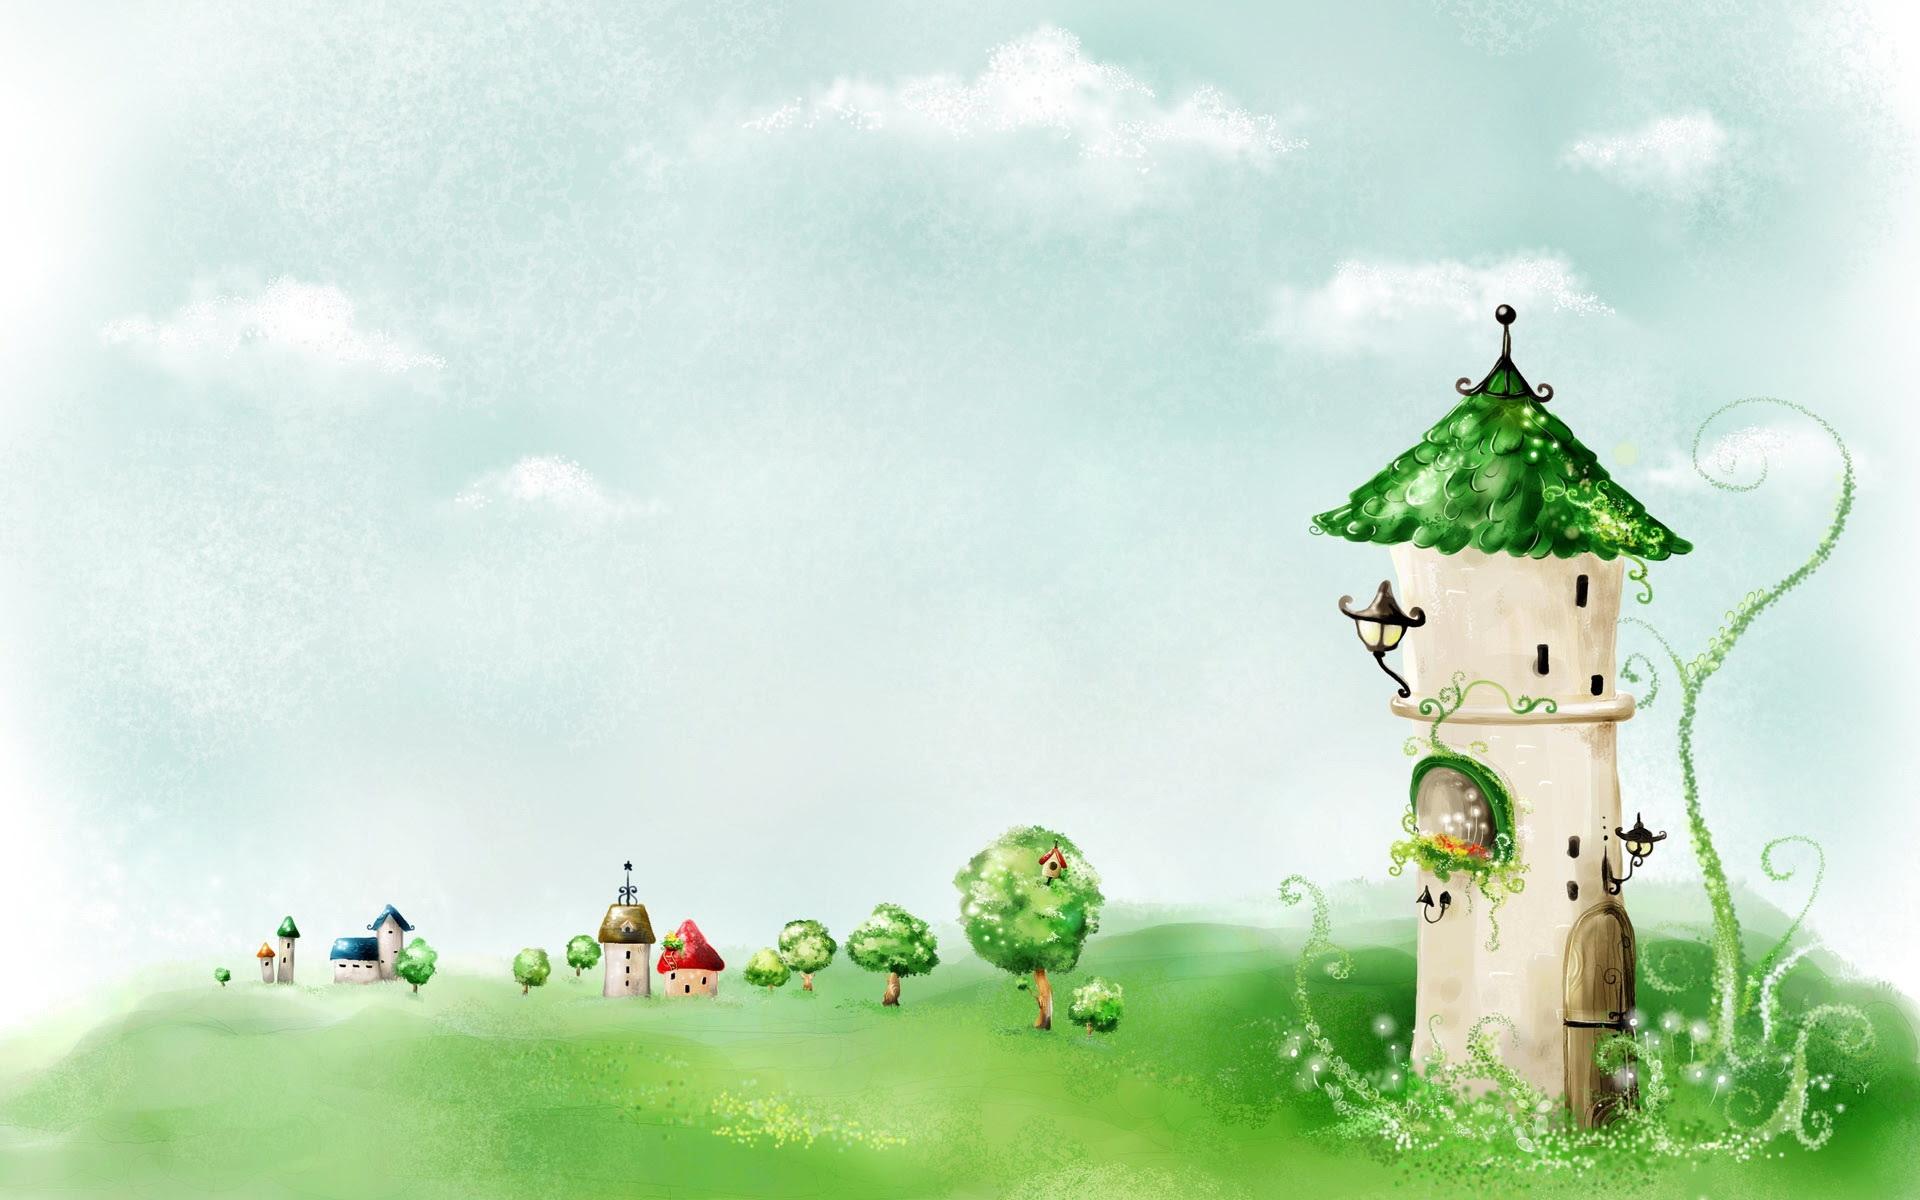 Background Children Wallpaper Hd - Allwallpaper